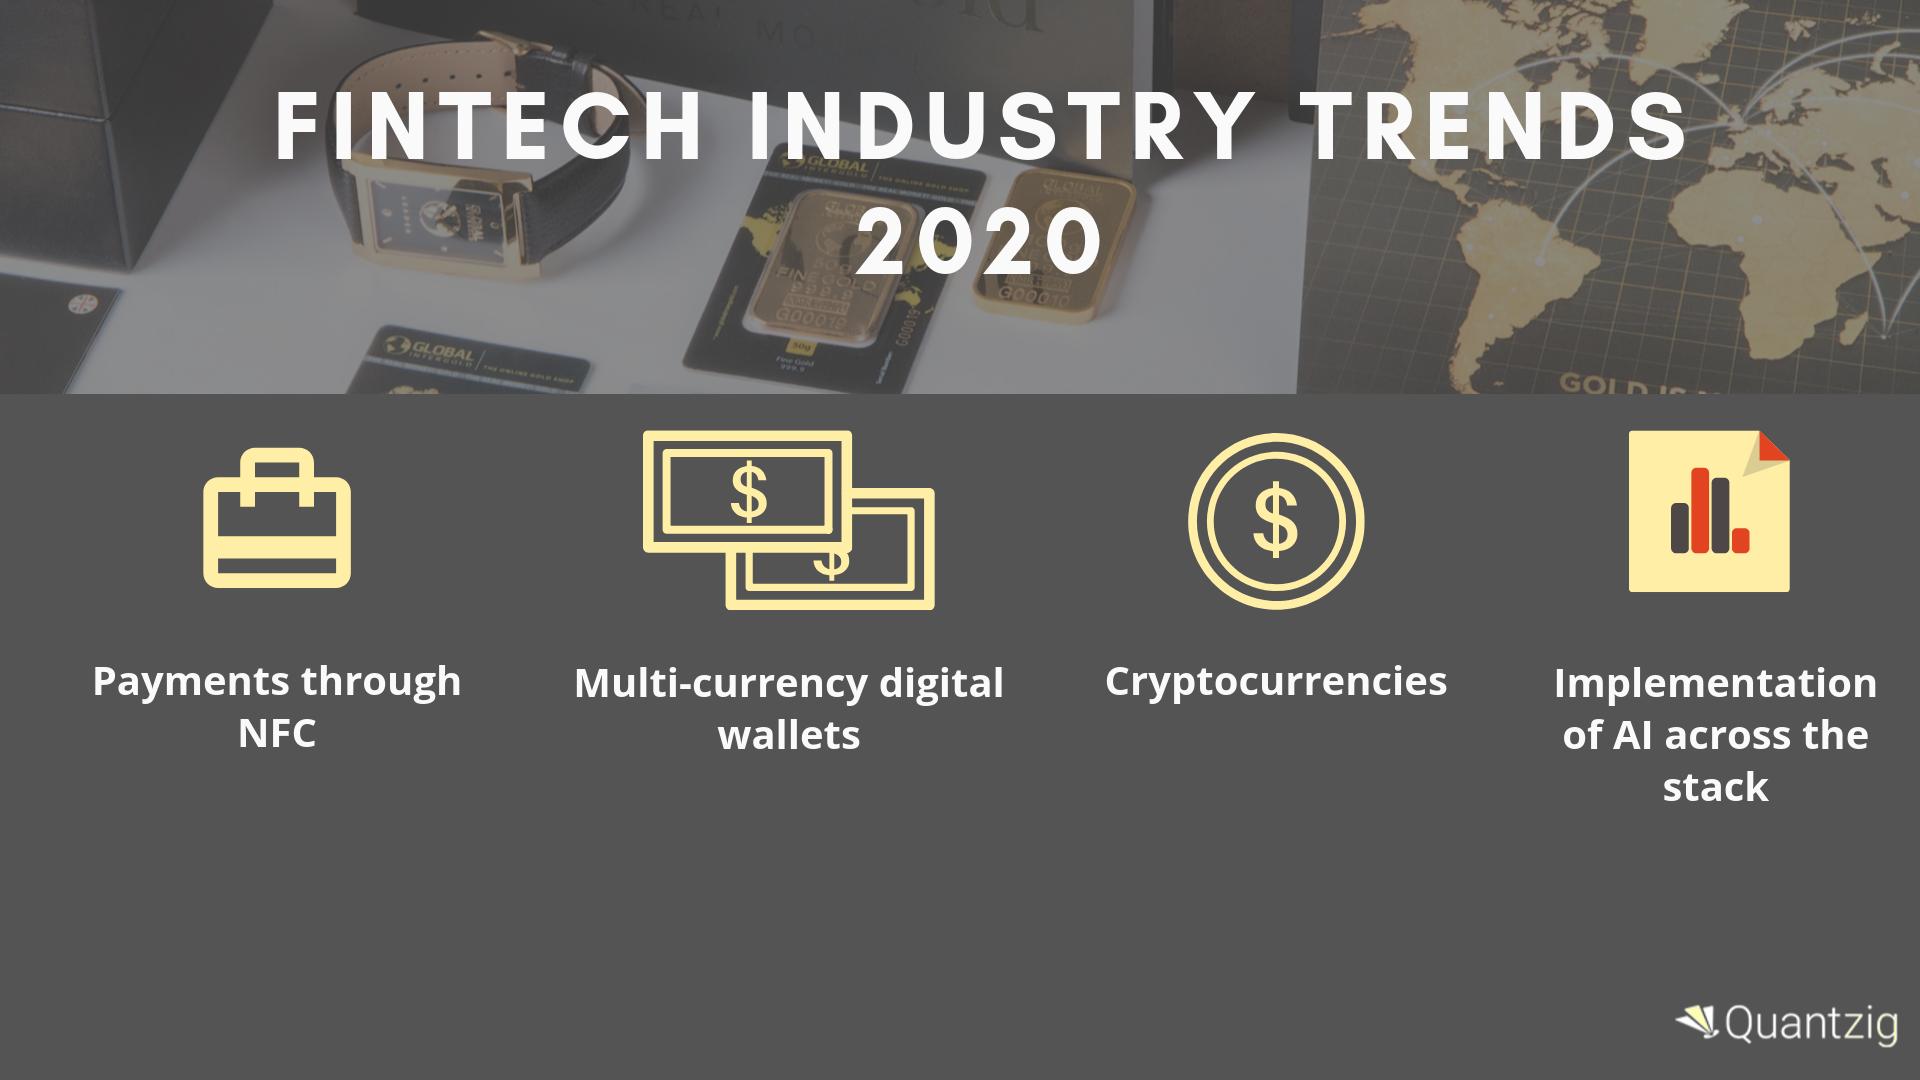 Fintech Industry Trends 2020